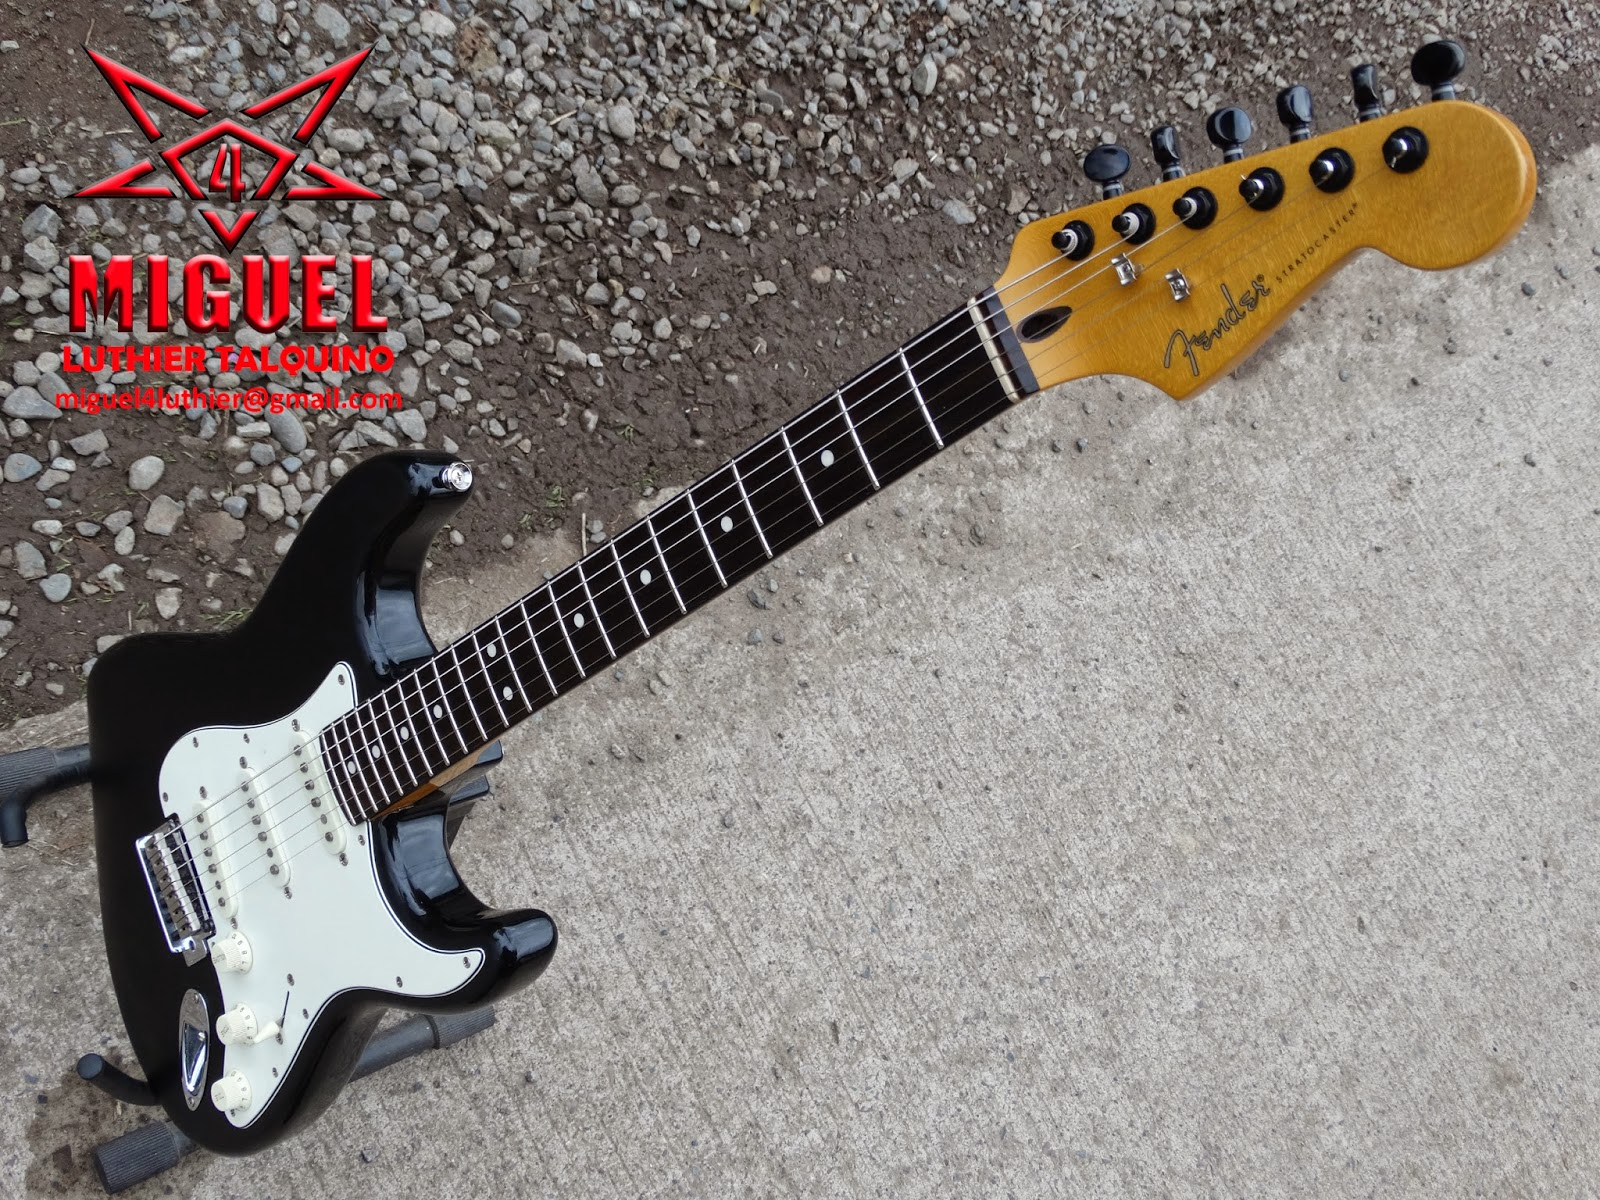 Fender Stratocaster Made In China : luthier miguel4 talca guitarra electrica fender stratocaster made in china cambios ~ Hamham.info Haus und Dekorationen